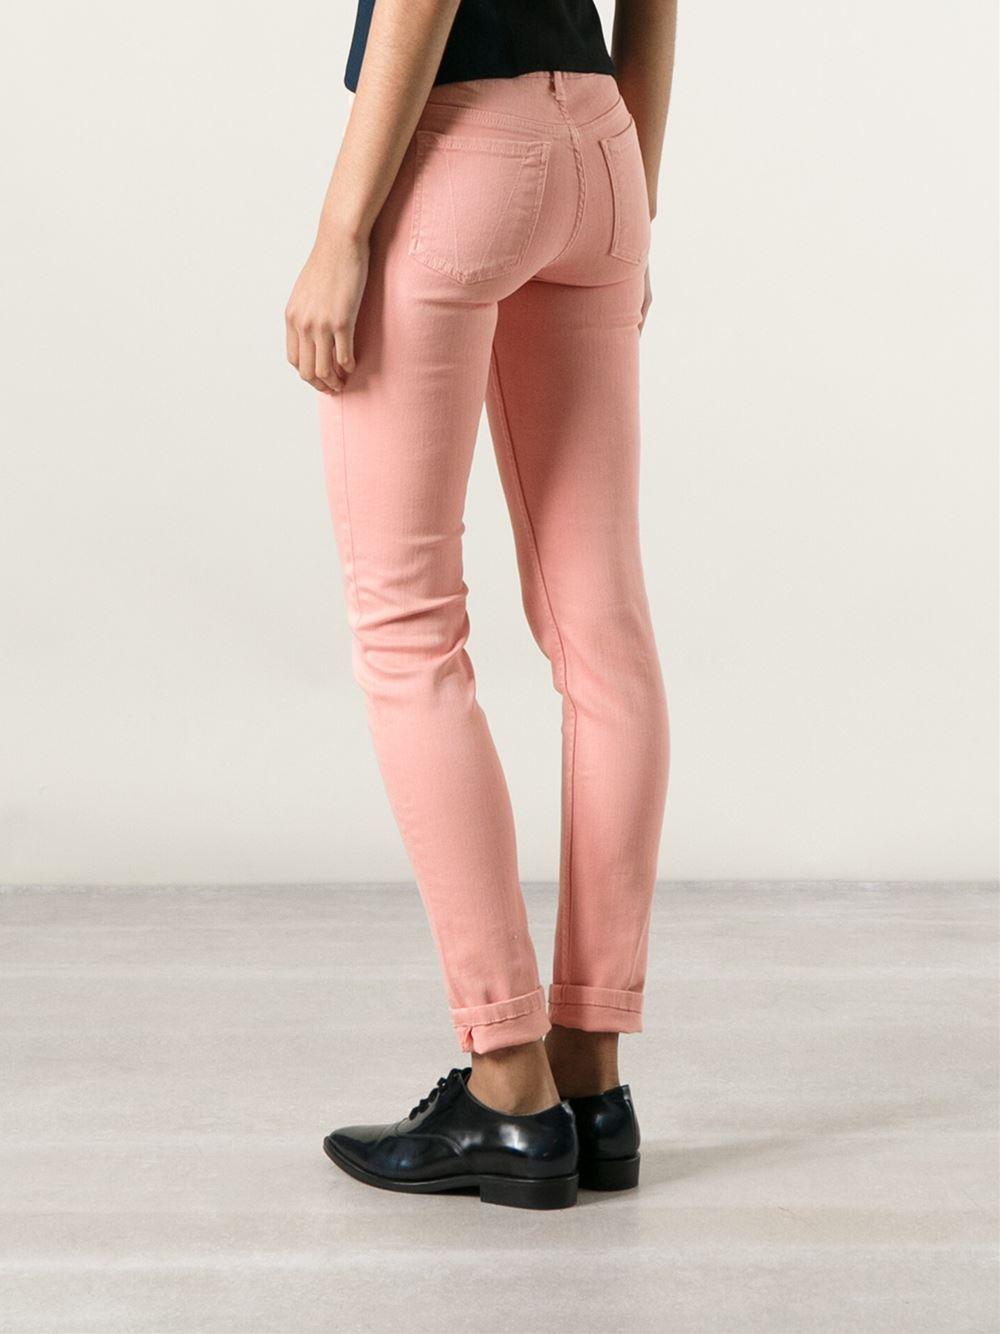 Victoria Beckham Skinny Jeans in Pink & Purple (Pink)